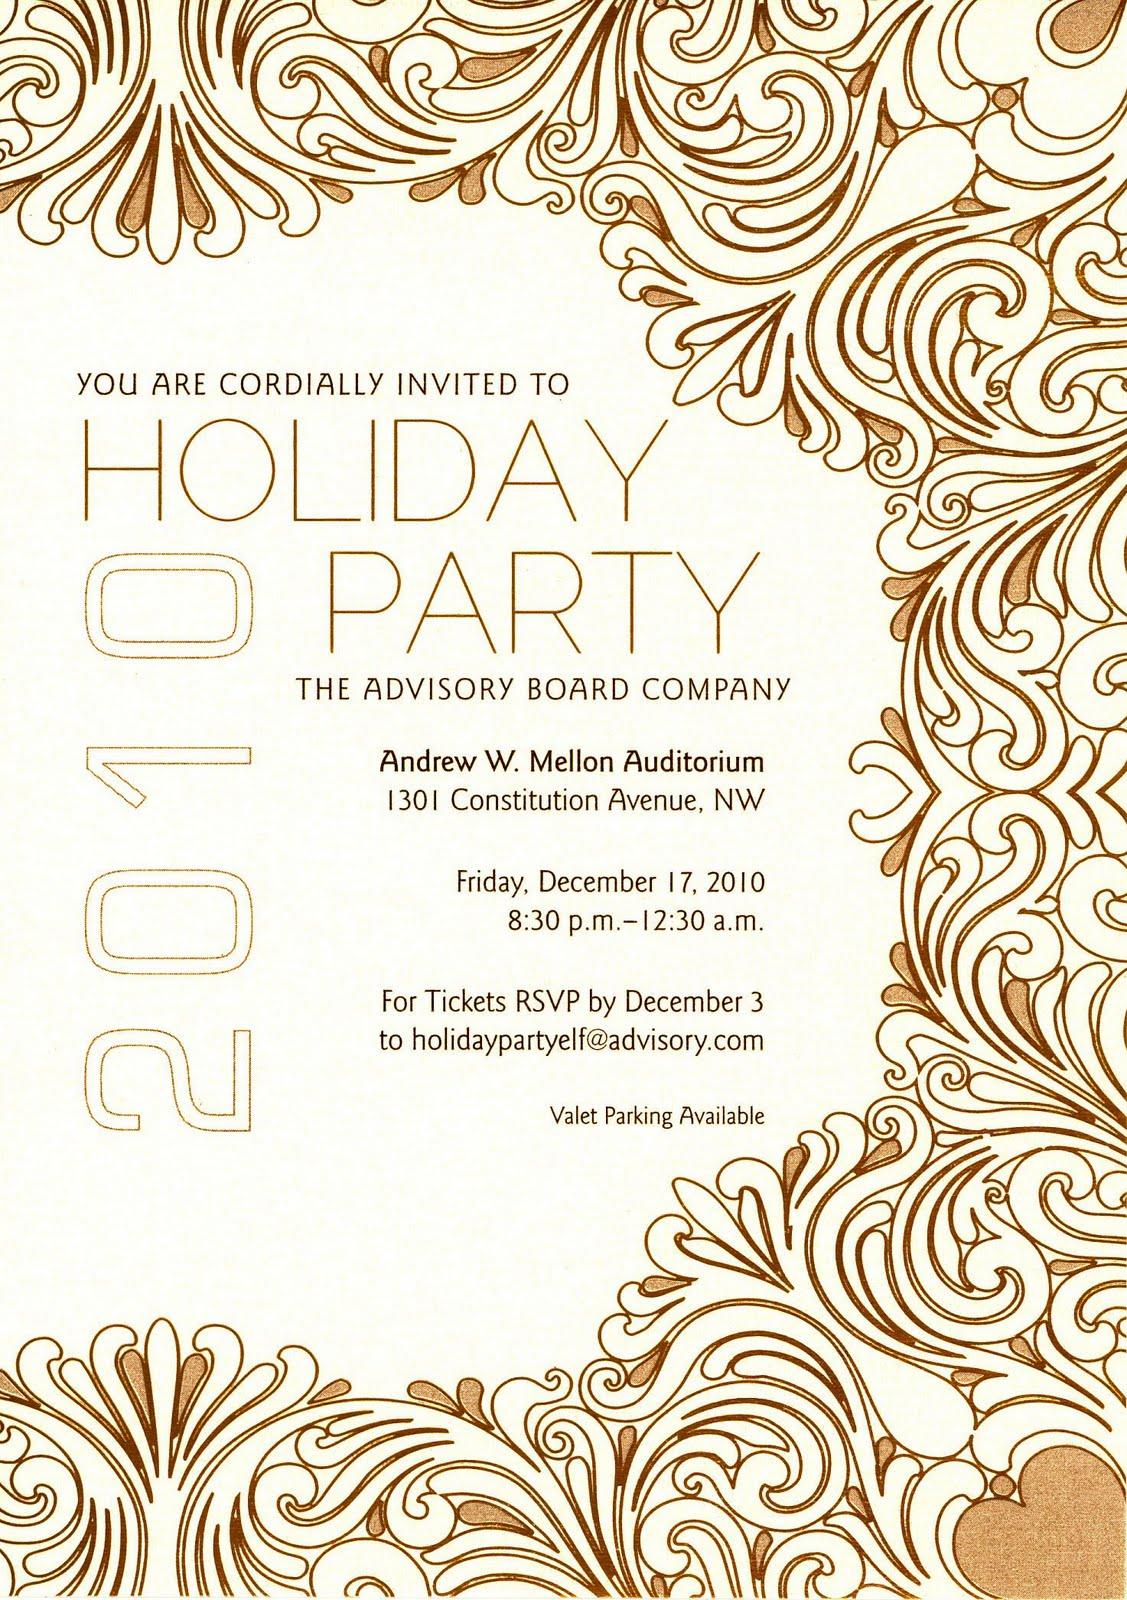 Stunning Corporate Party Invitations Ideas - Invitation Card Ideas ...